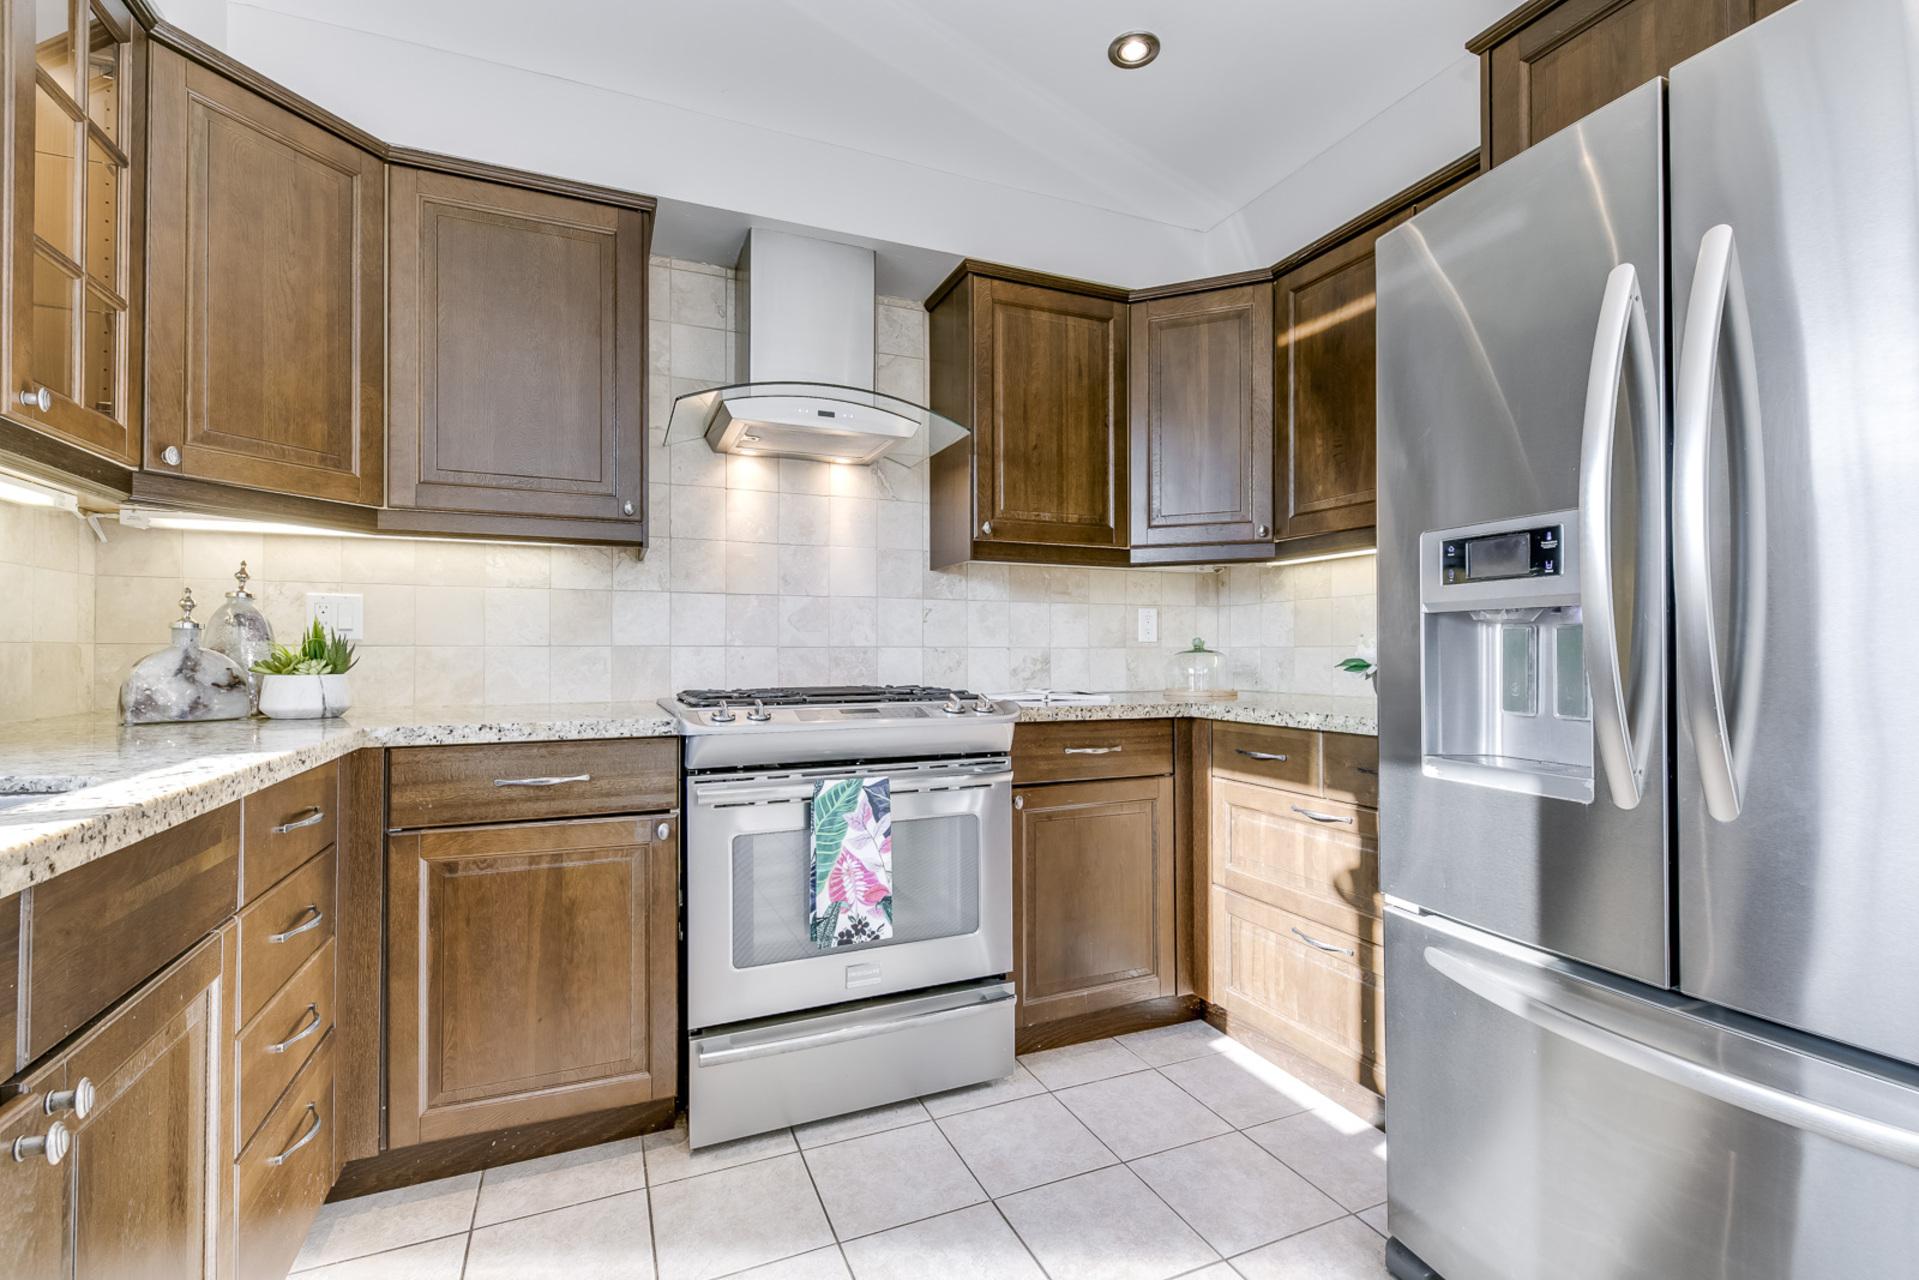 Kitchen - 1509 Clearview Dr, Oakville - Elite3 & Team at 1509 Clearview Drive, Clearview, Oakville